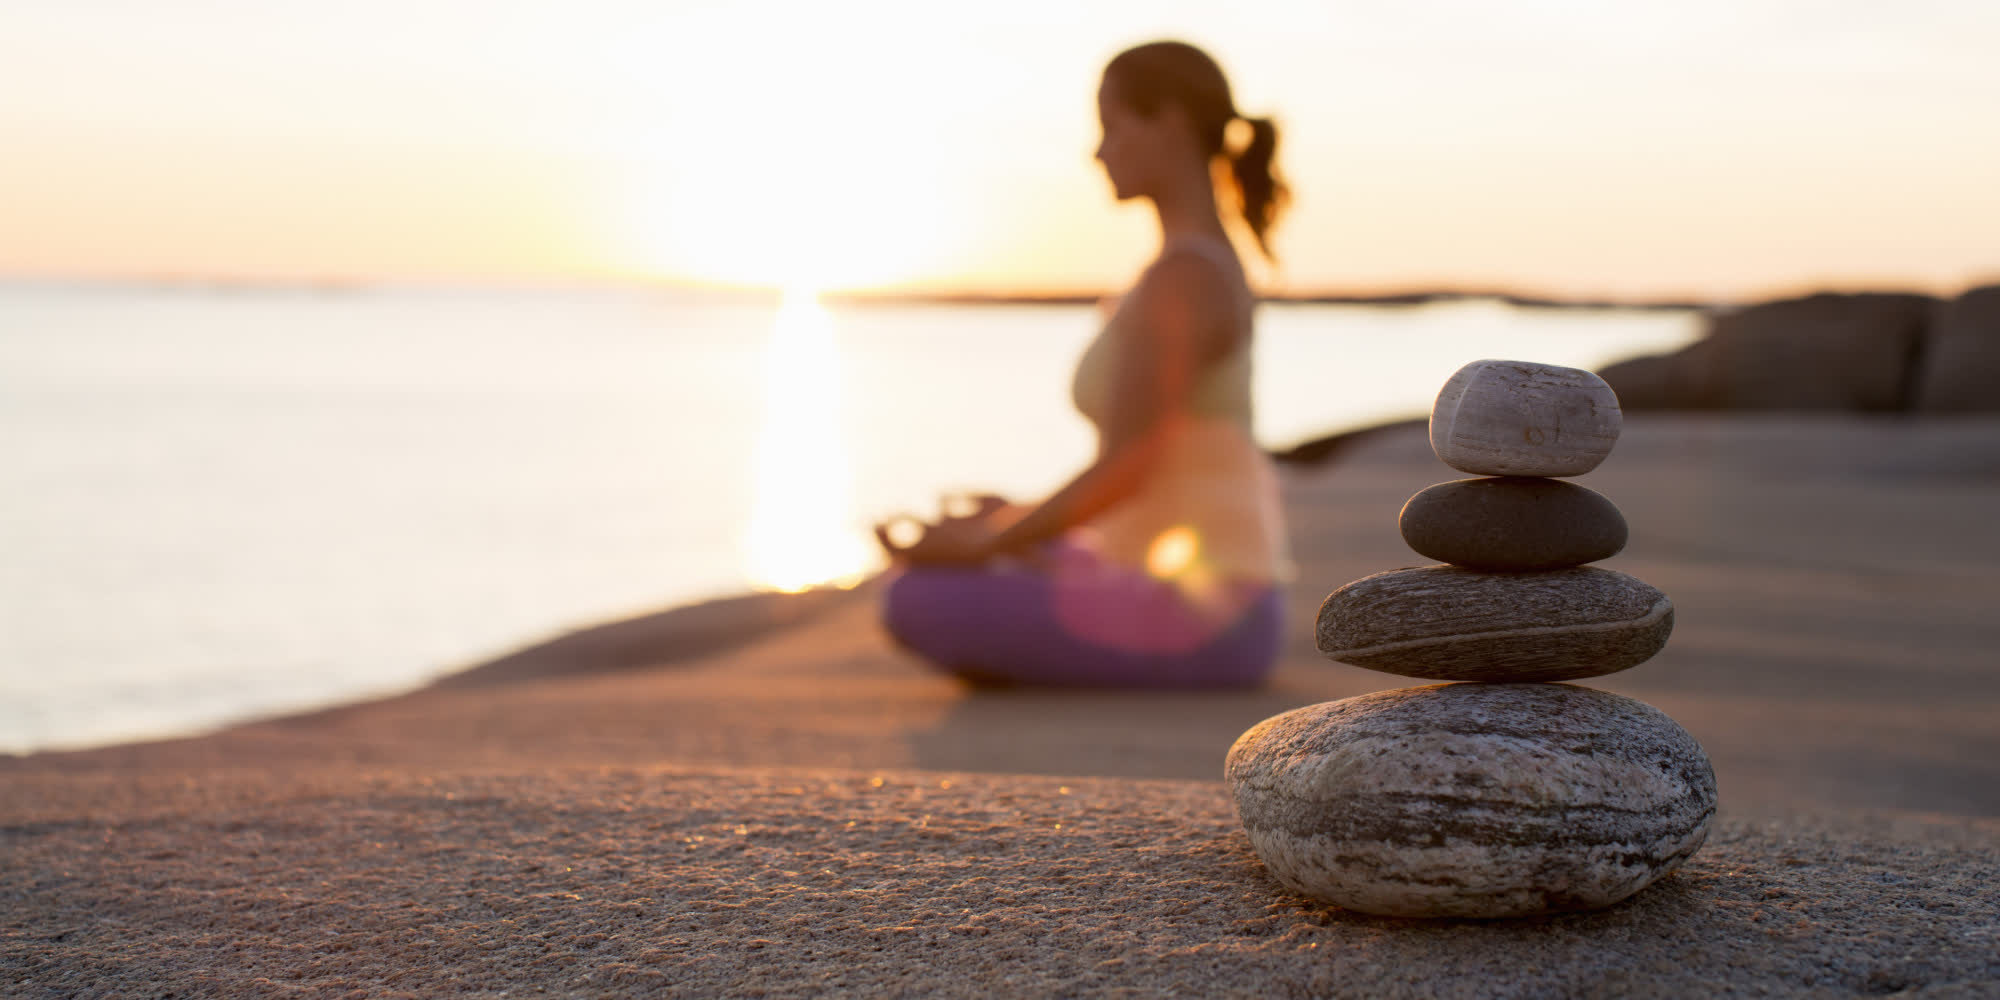 4 ways you can zen this week